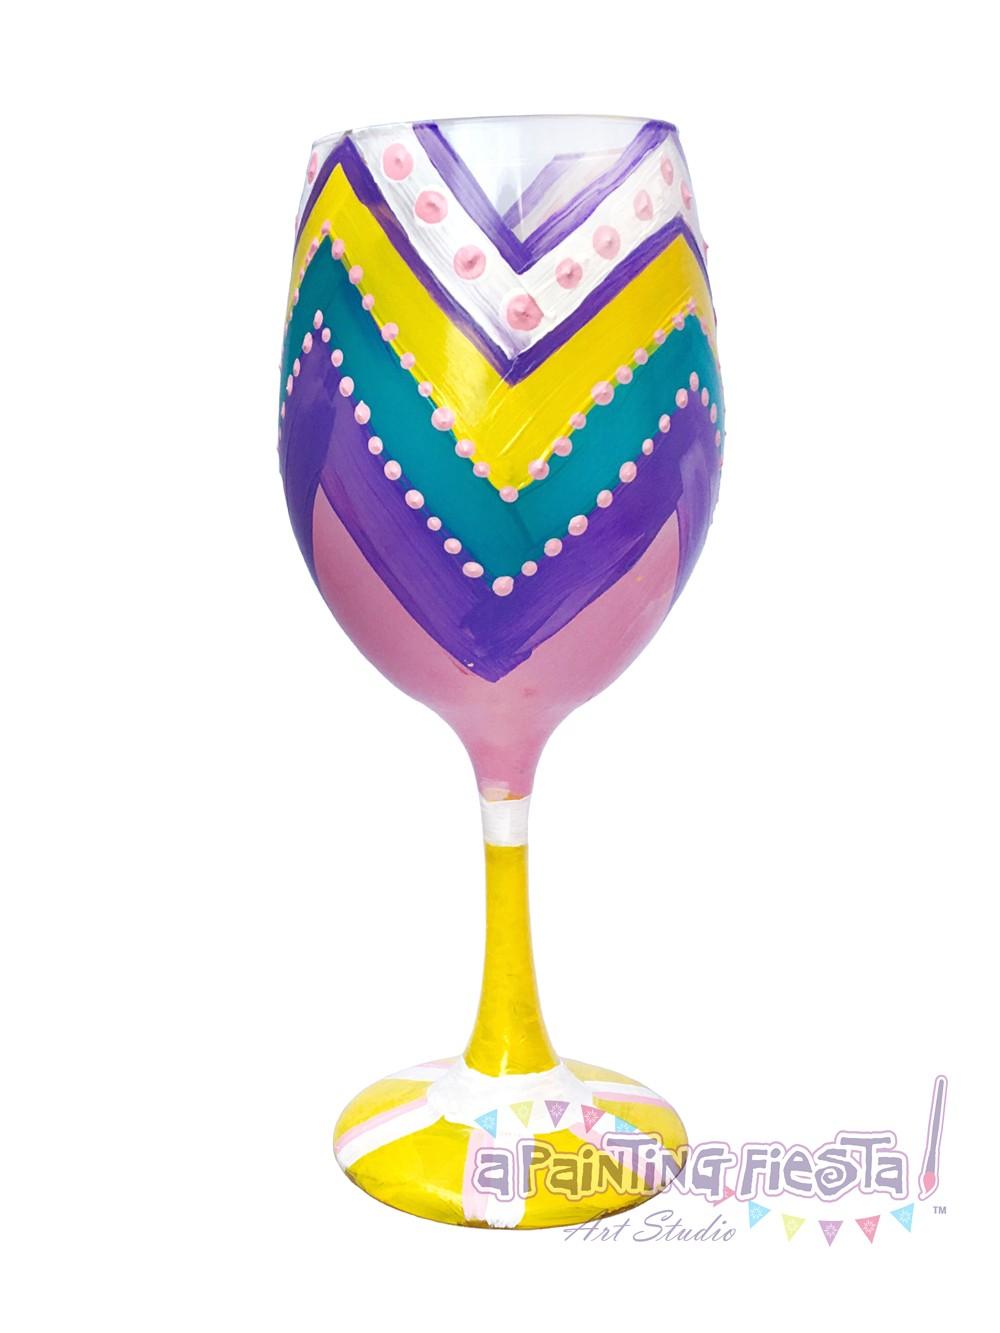 wine glass painting 2017 08 31